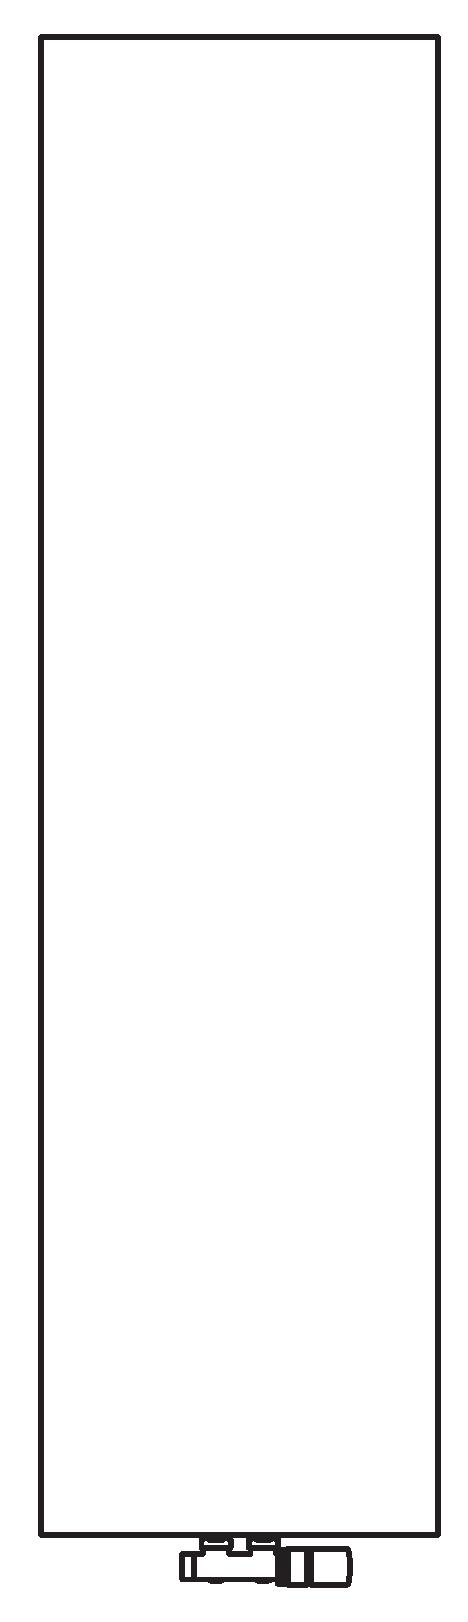 1585x420